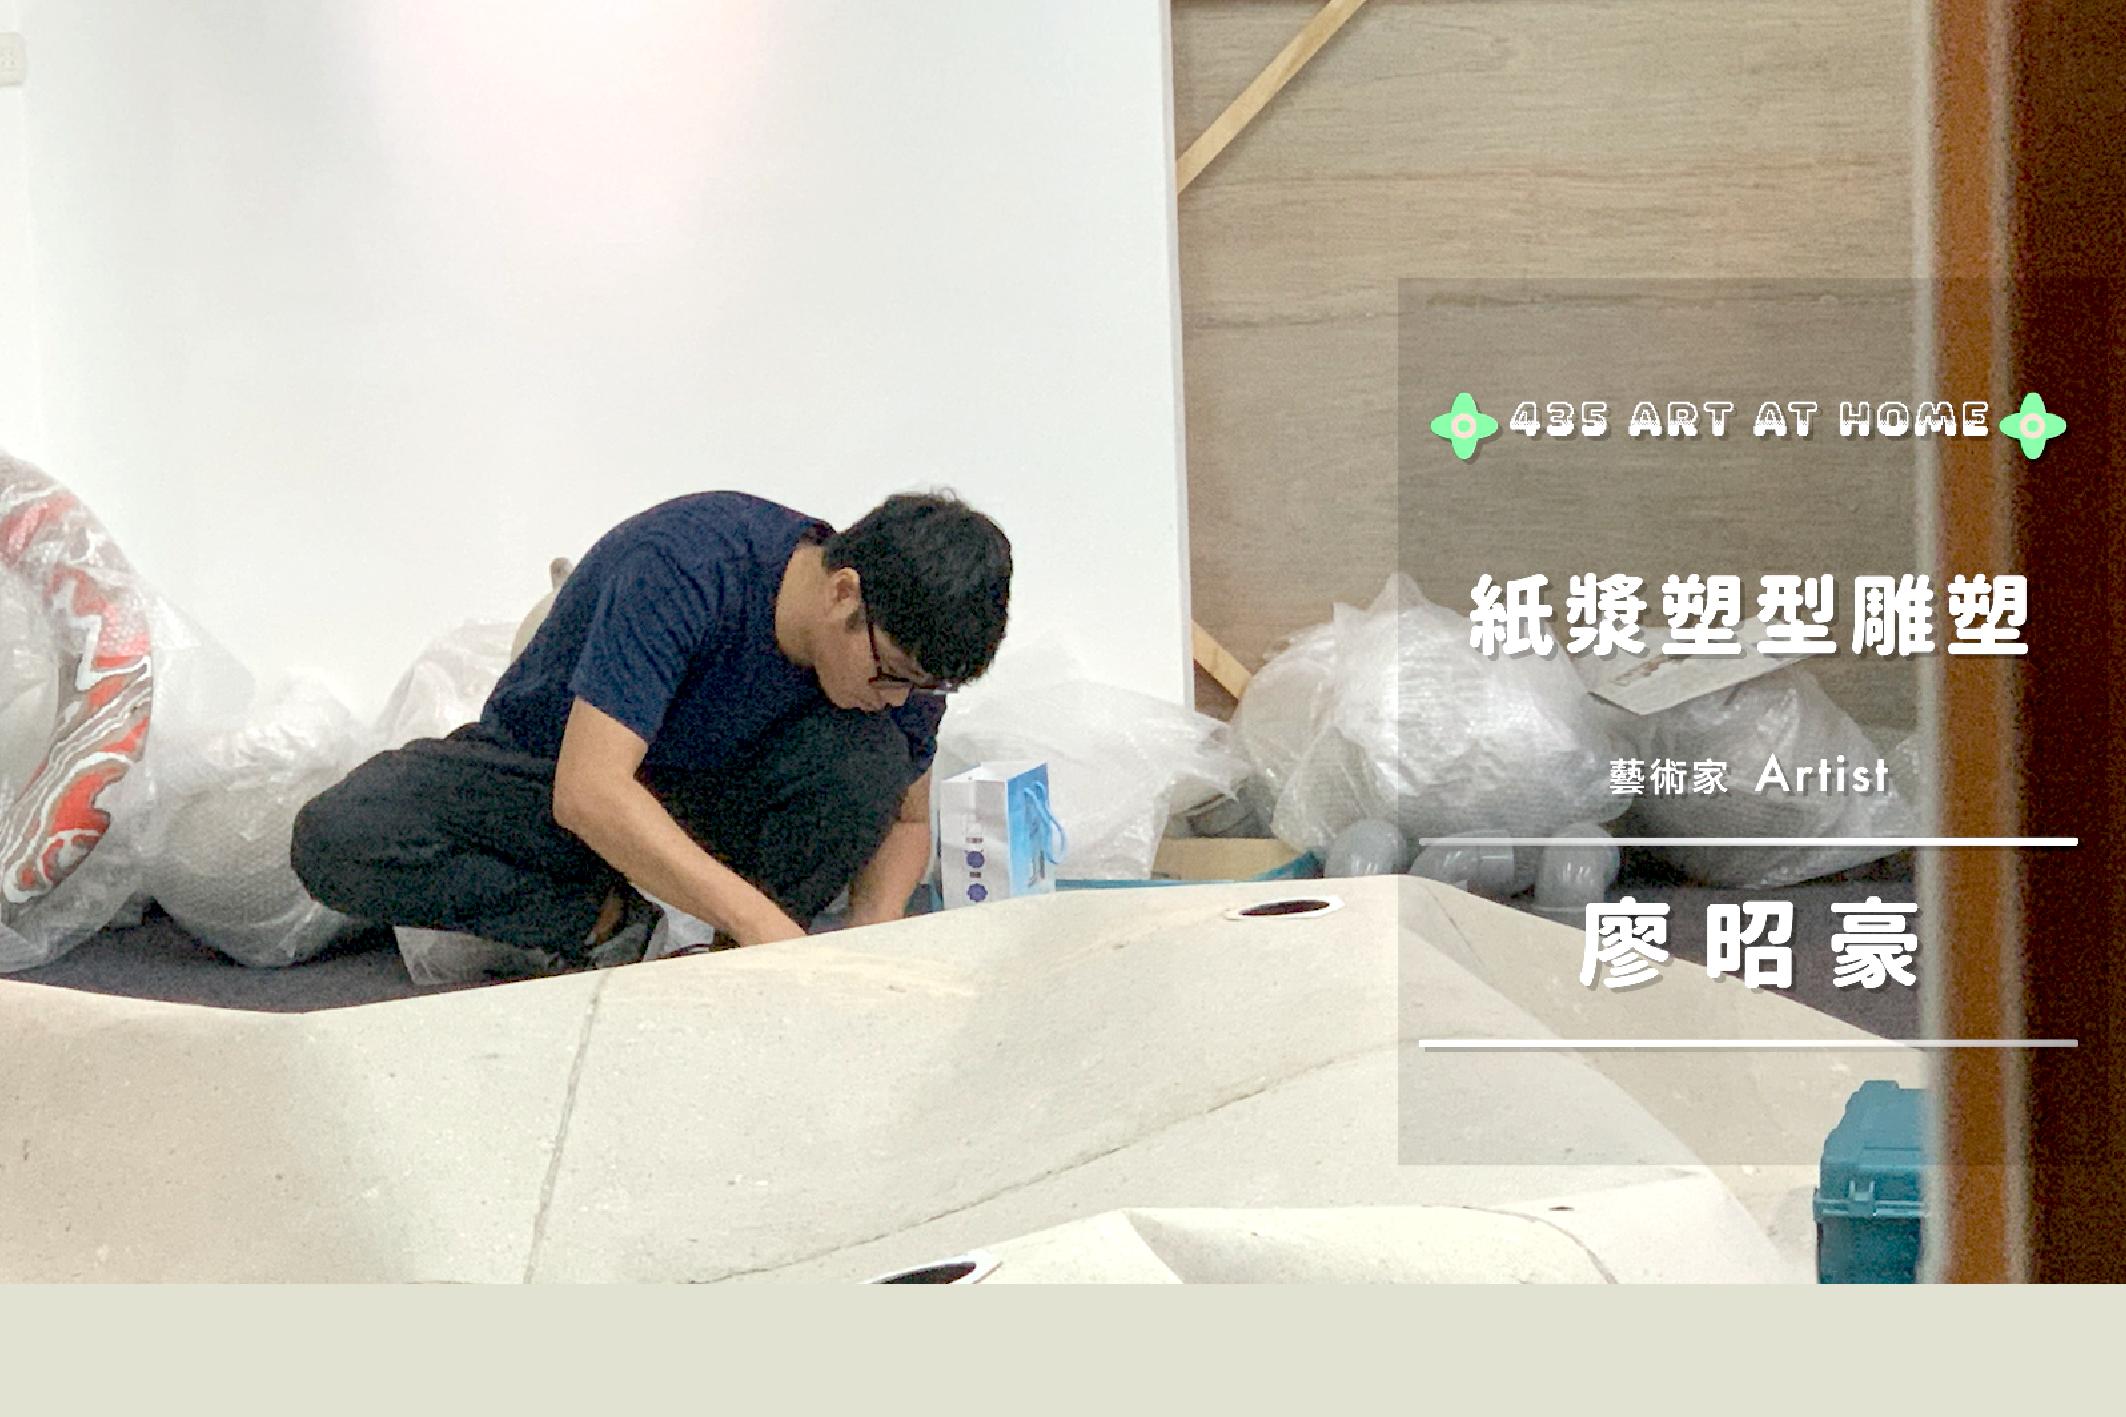 【🏠 435 ART AT HOME 🏠】EP02|廖昭豪|《紙漿塑型雕塑》